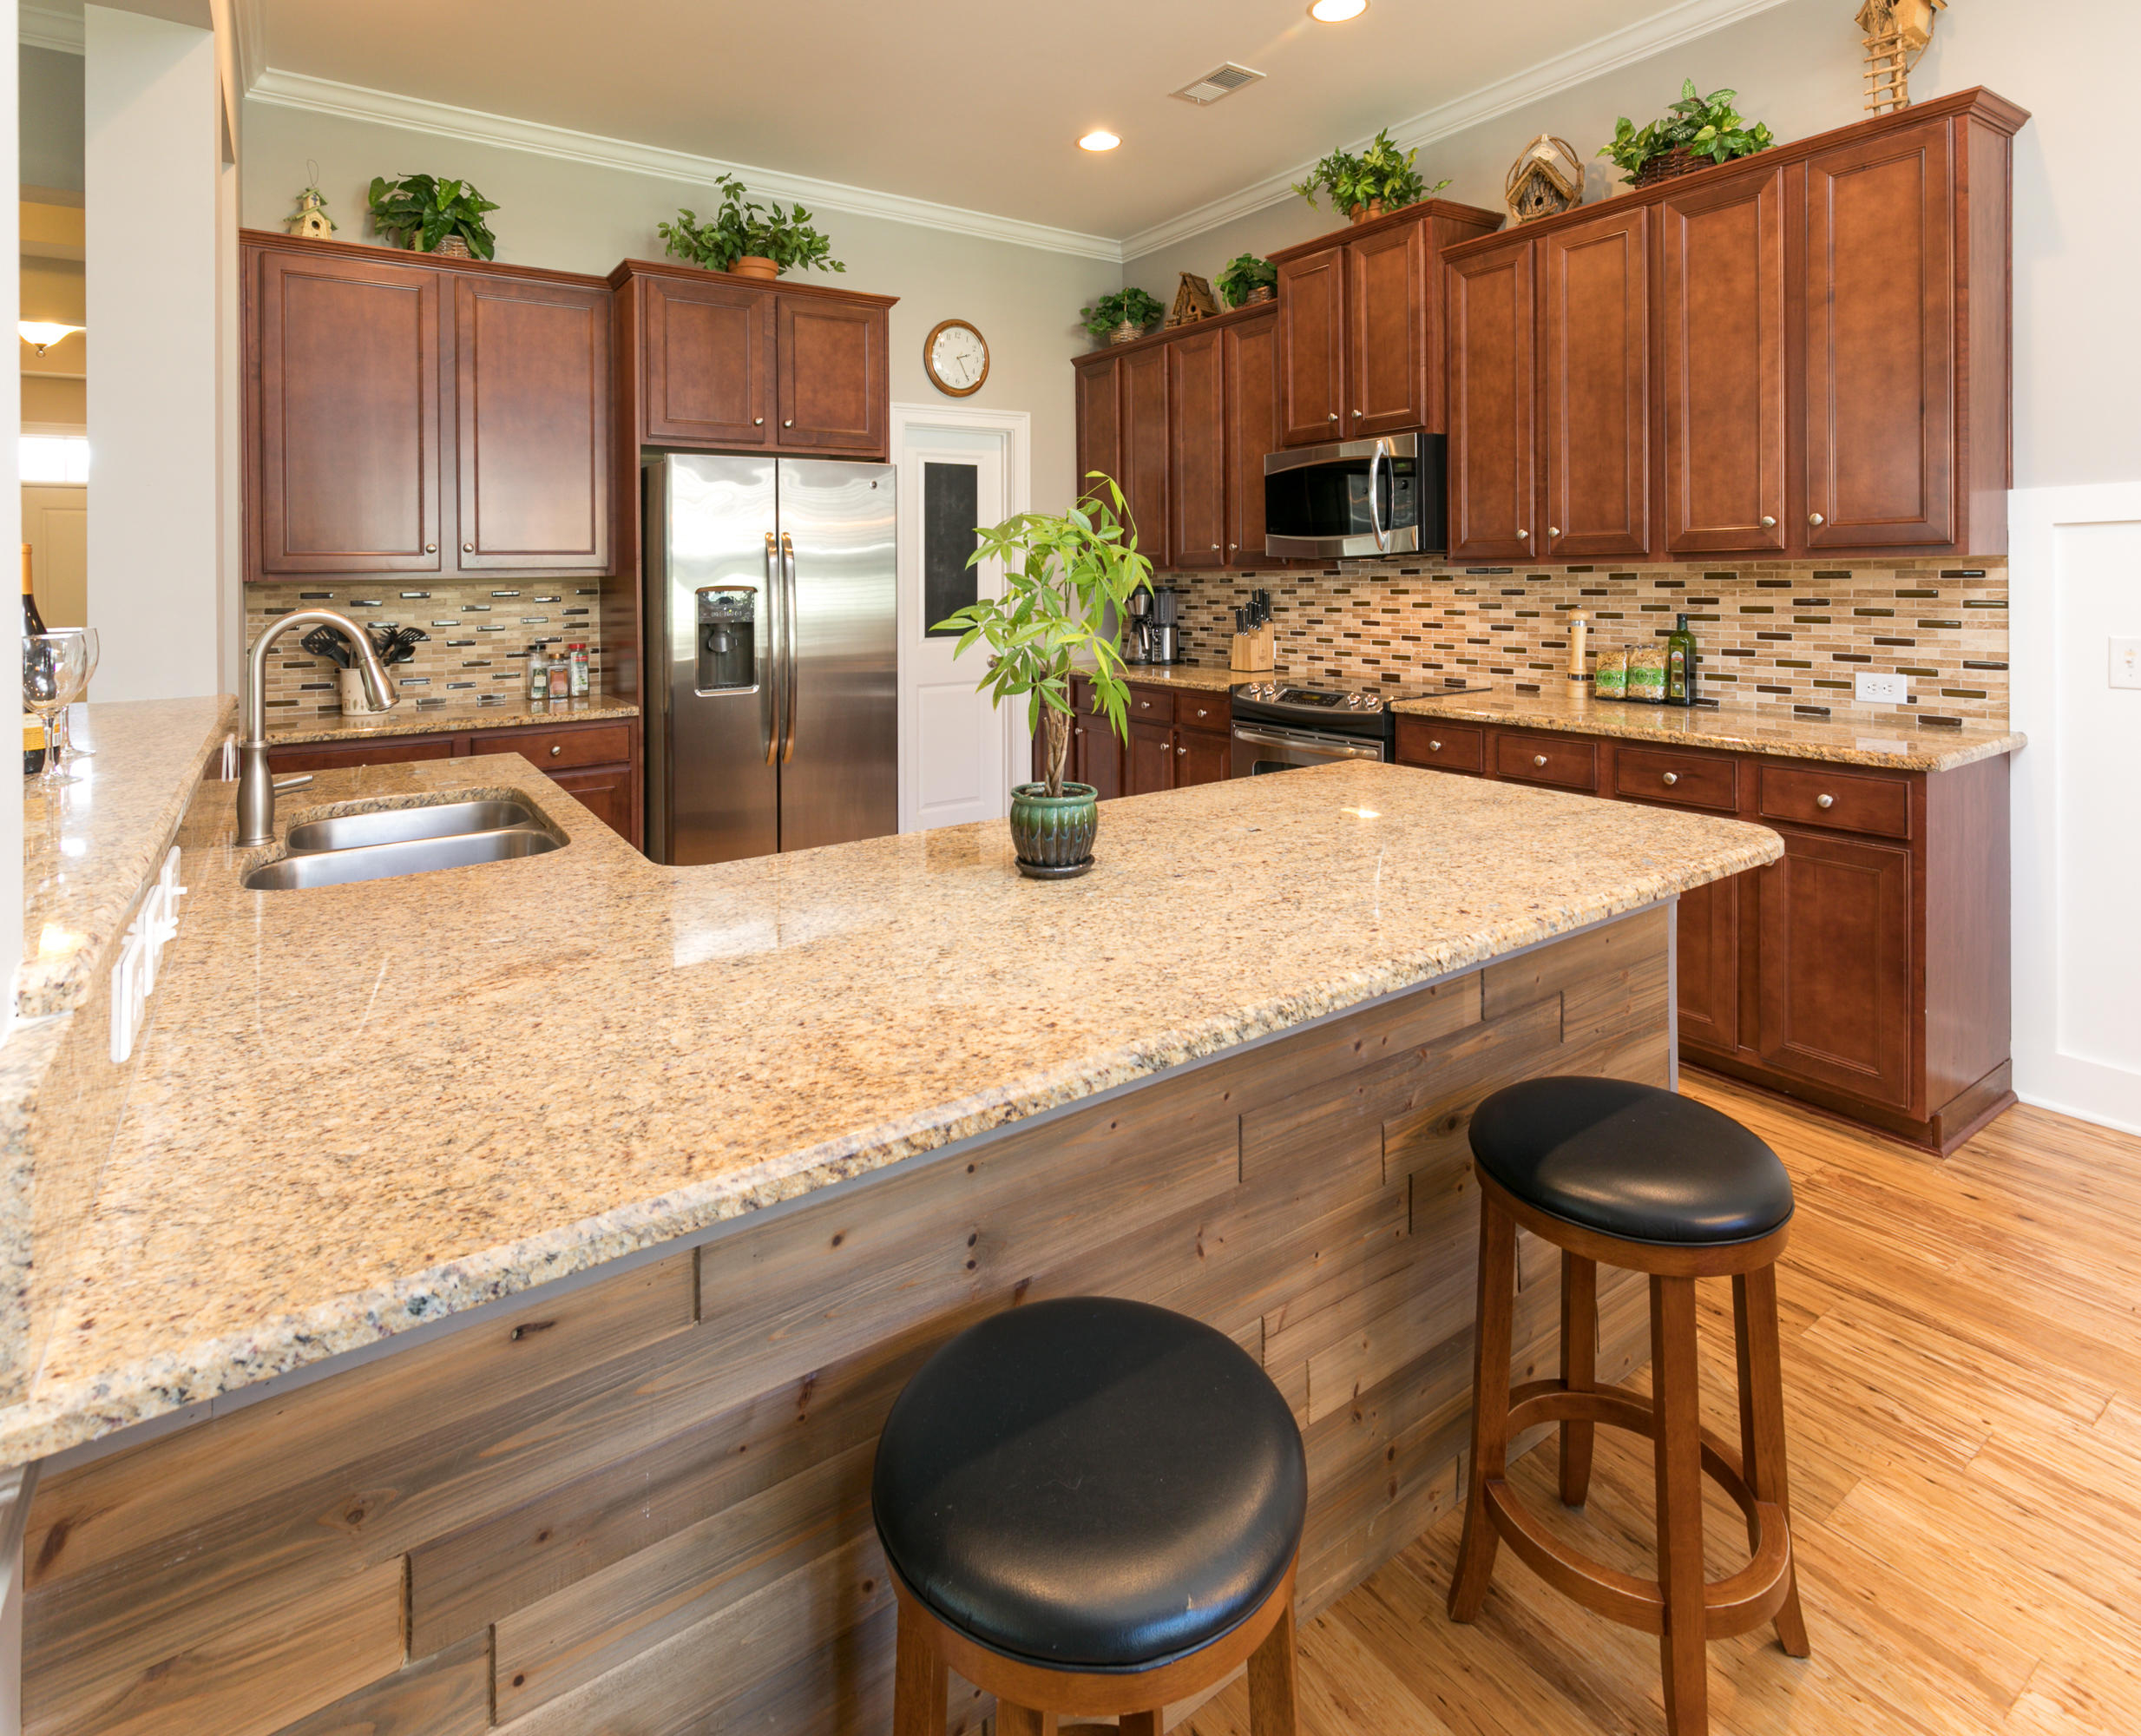 Carolina Park Homes For Sale - 1472 Croaton, Mount Pleasant, SC - 11